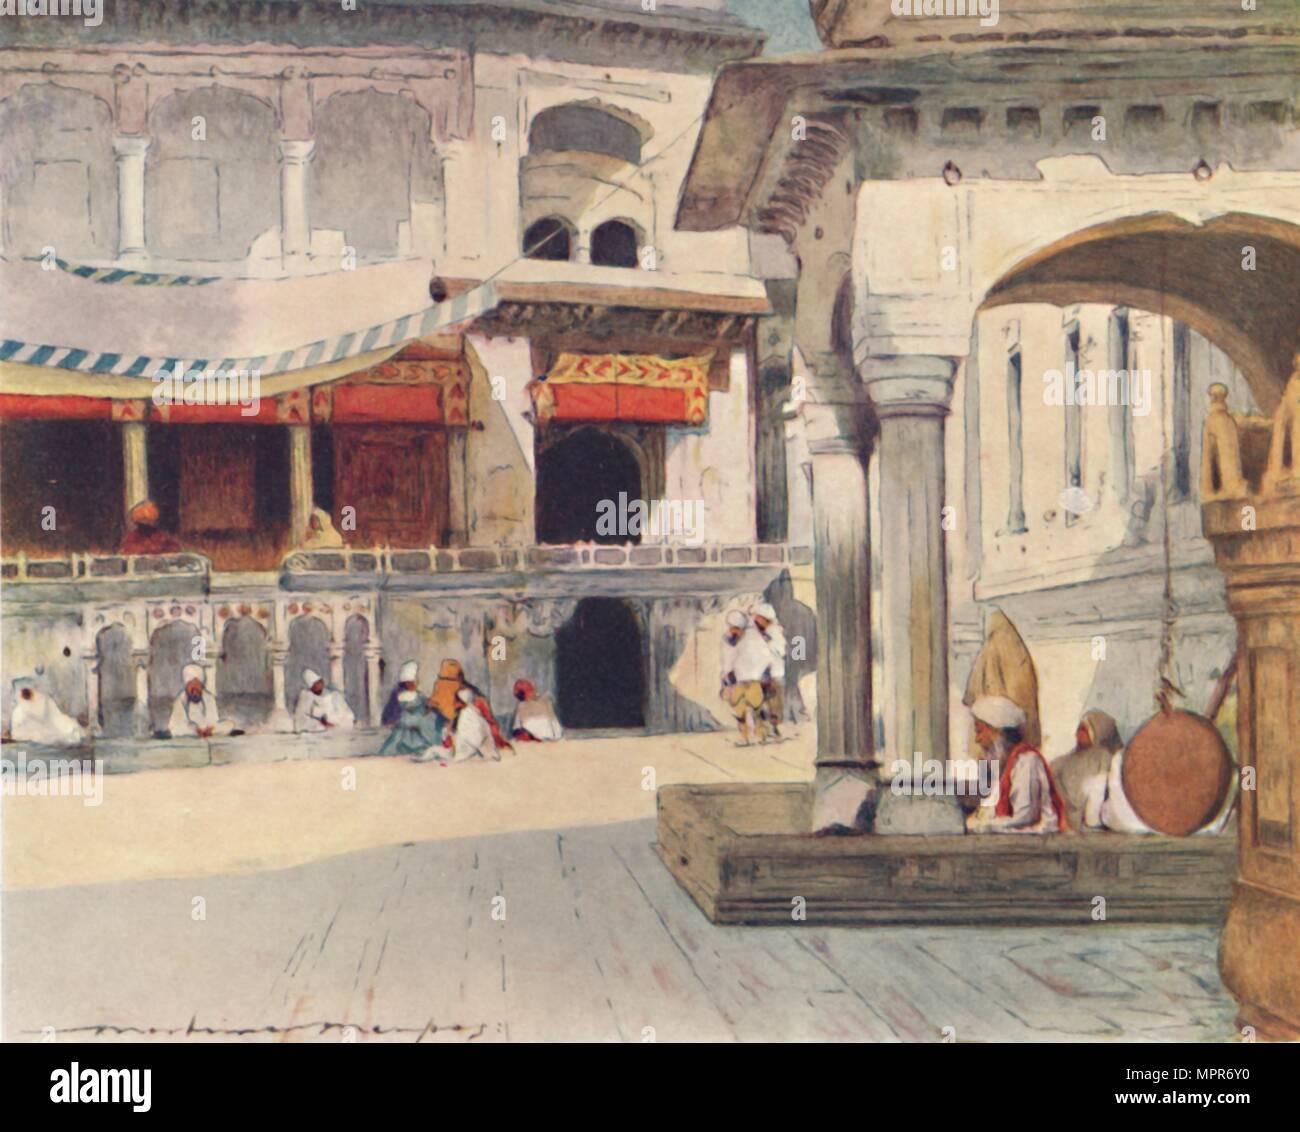 'In the Temple of Amritsar', 1905. Artist: Mortimer Luddington Menpes. - Stock Image